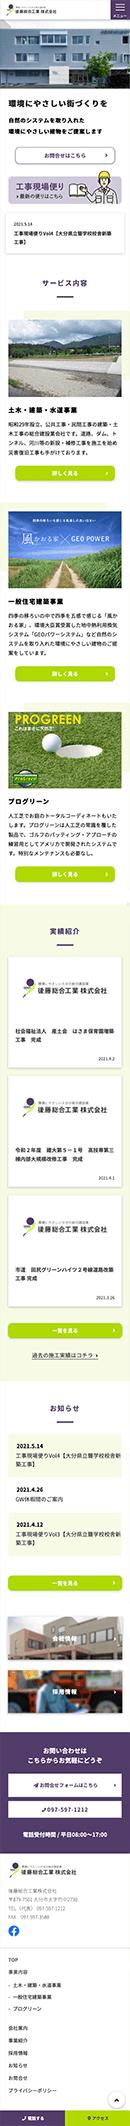 Webマーケティング_制作実績_後藤総合工業 株式会社_3